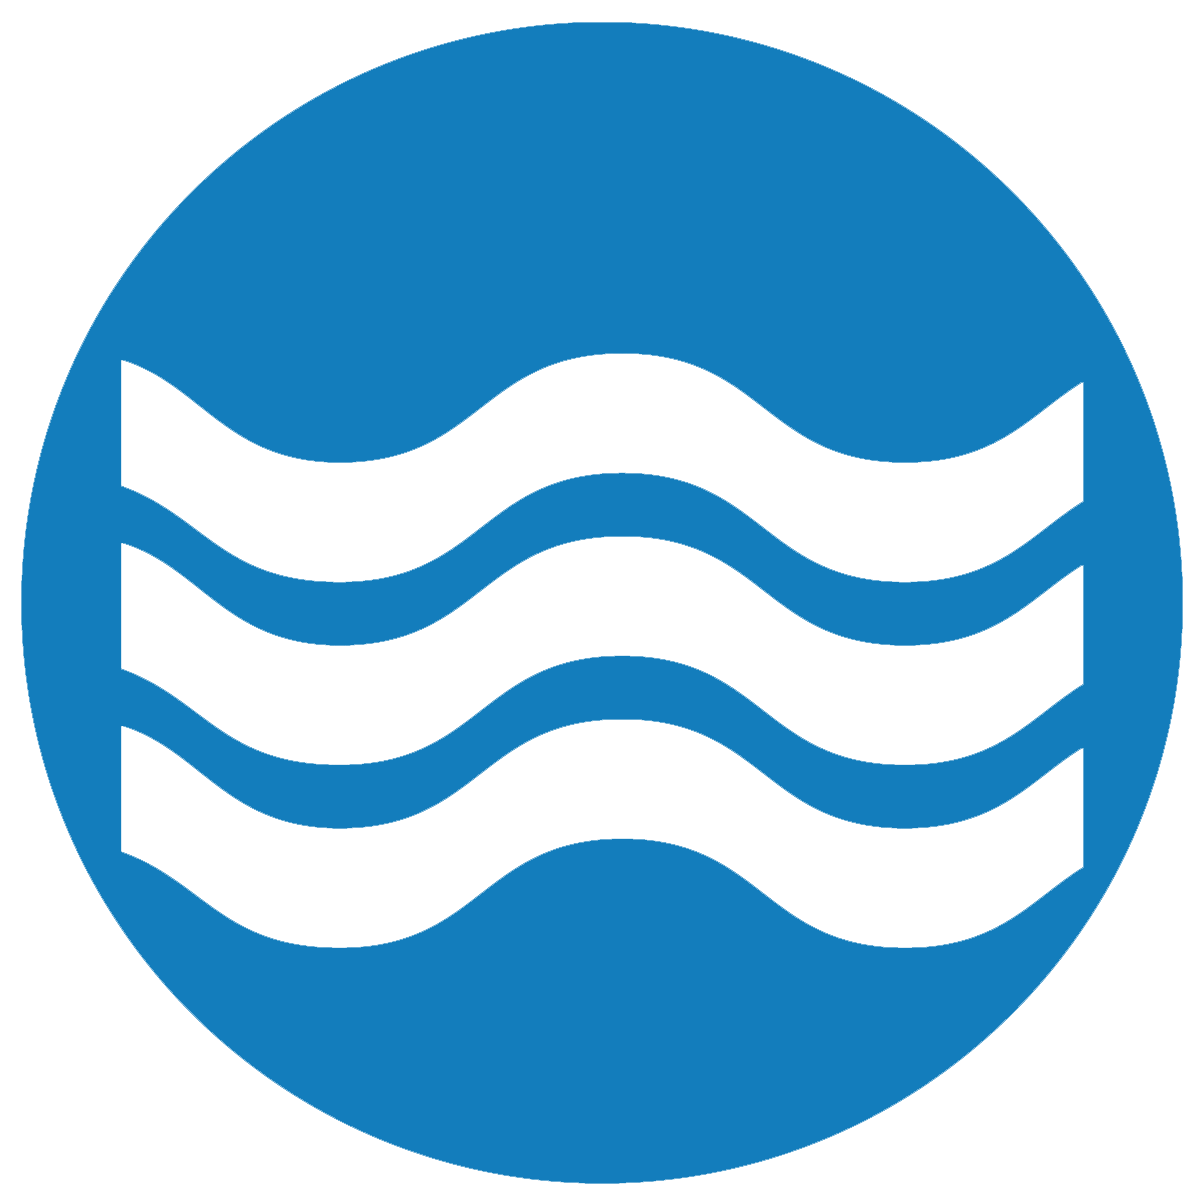 Wave icon on blue background